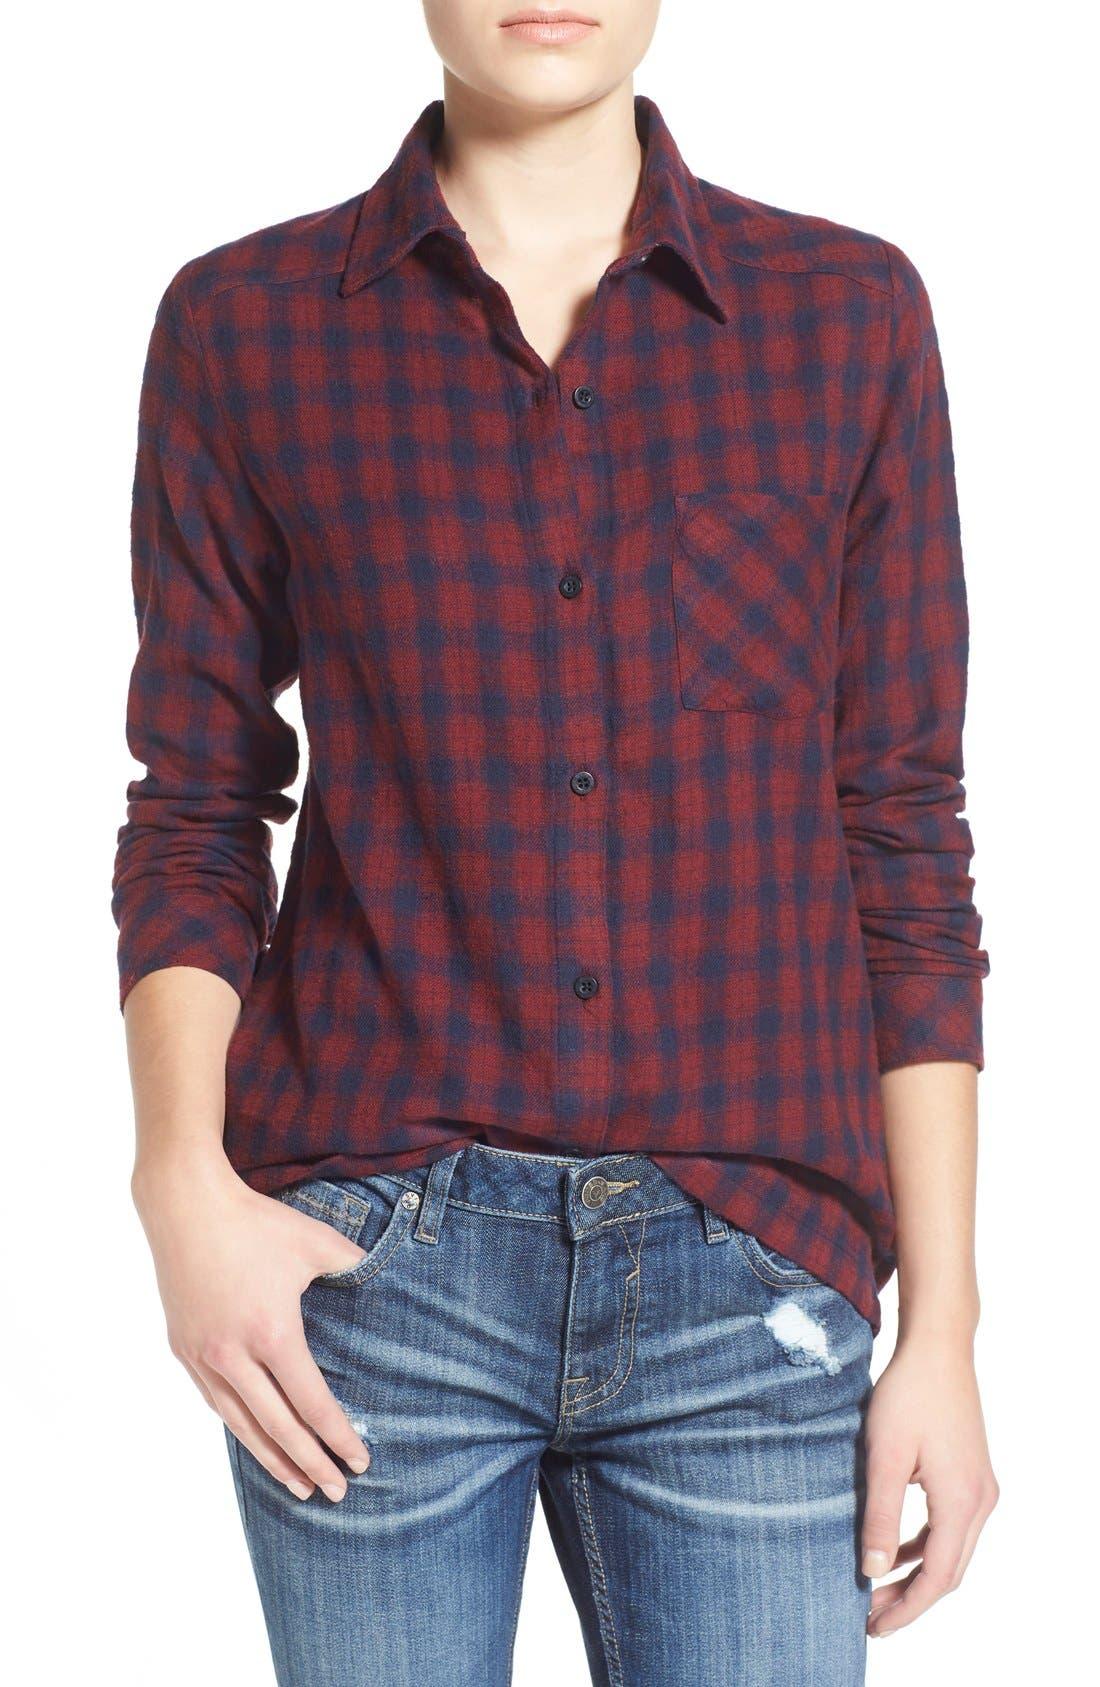 Main Image - RVCA'Jig 2'Plaid Shirt